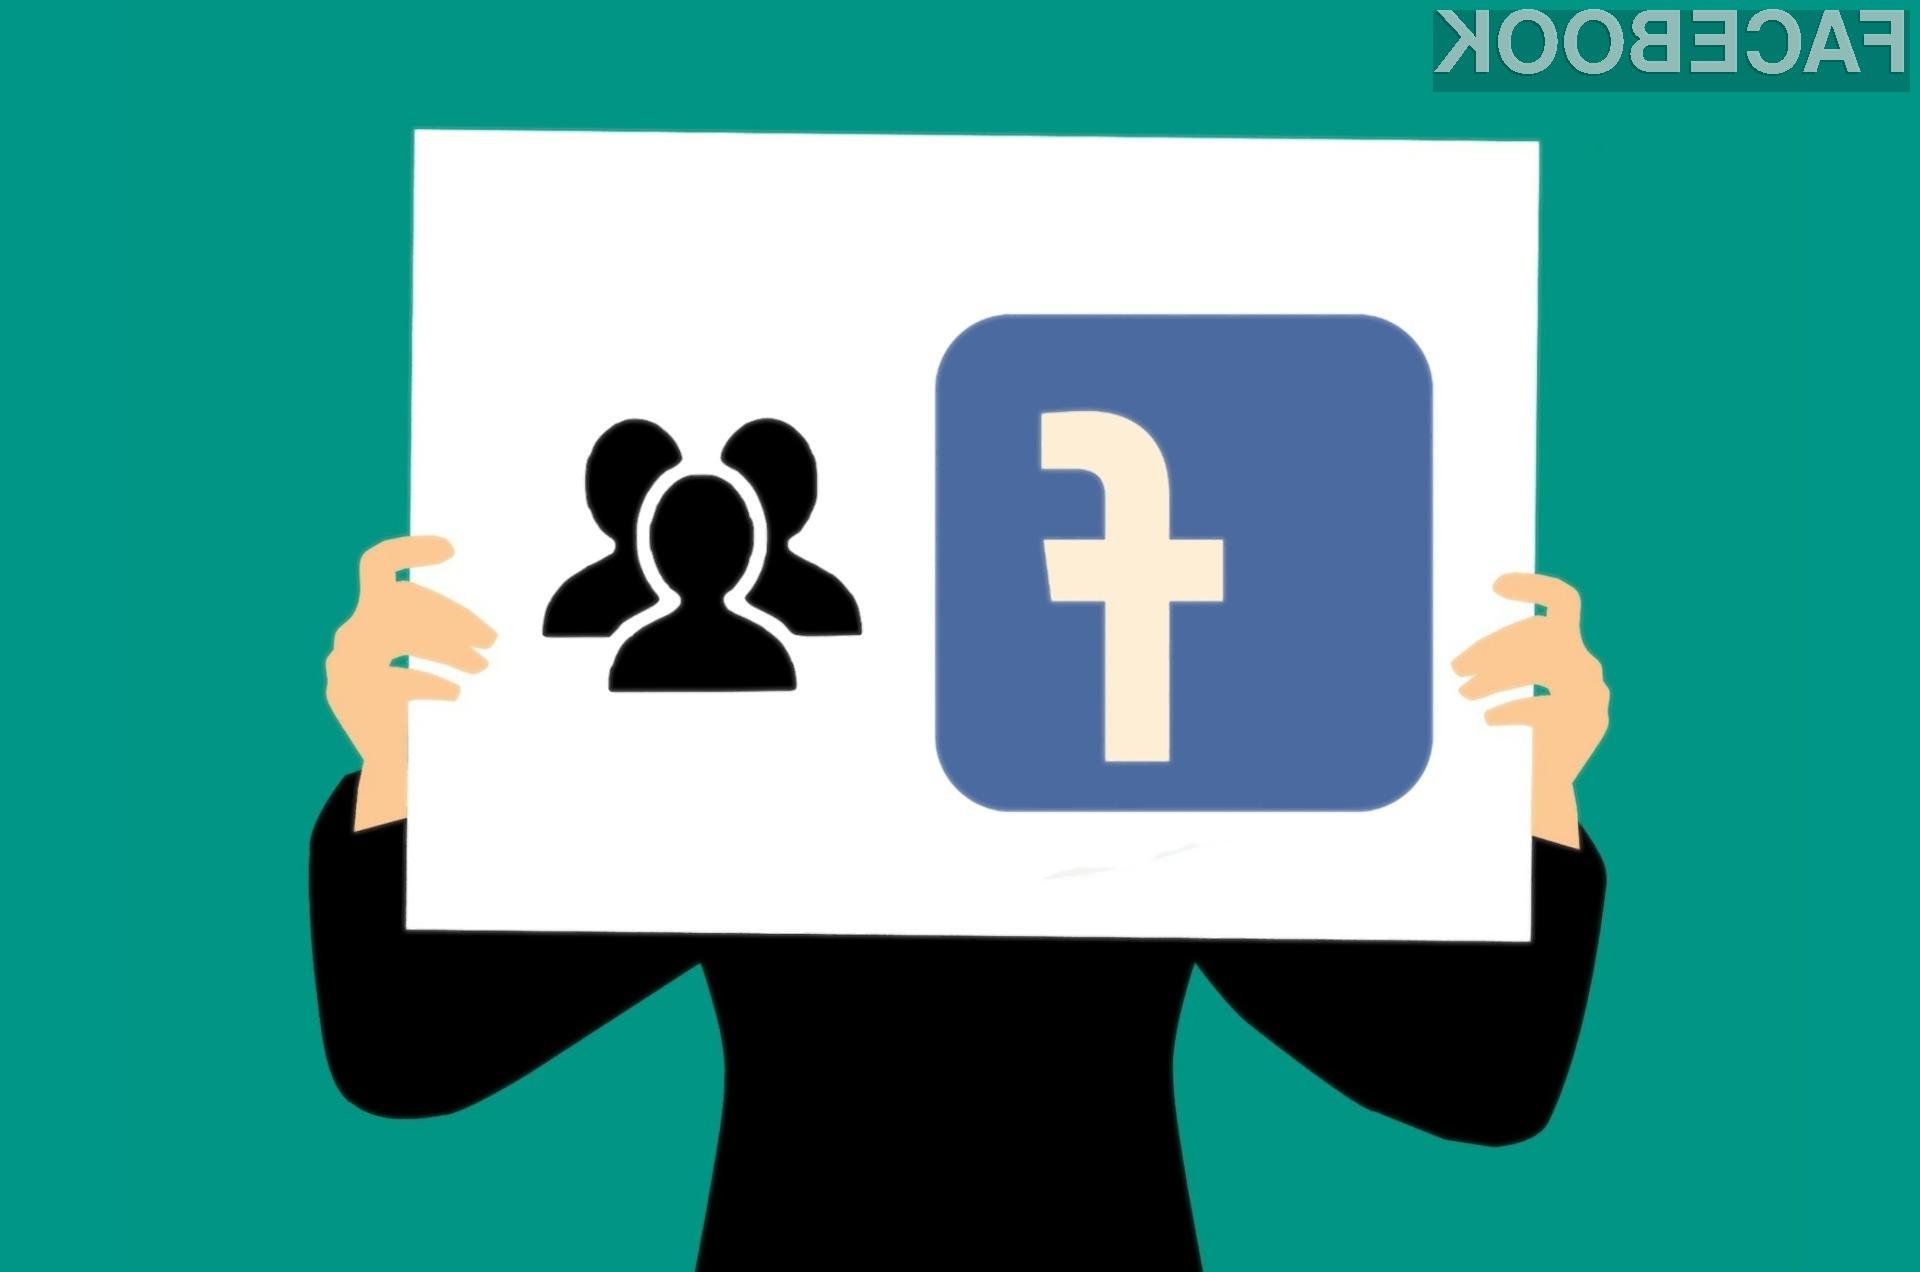 facebook-3314870_1920.jpg